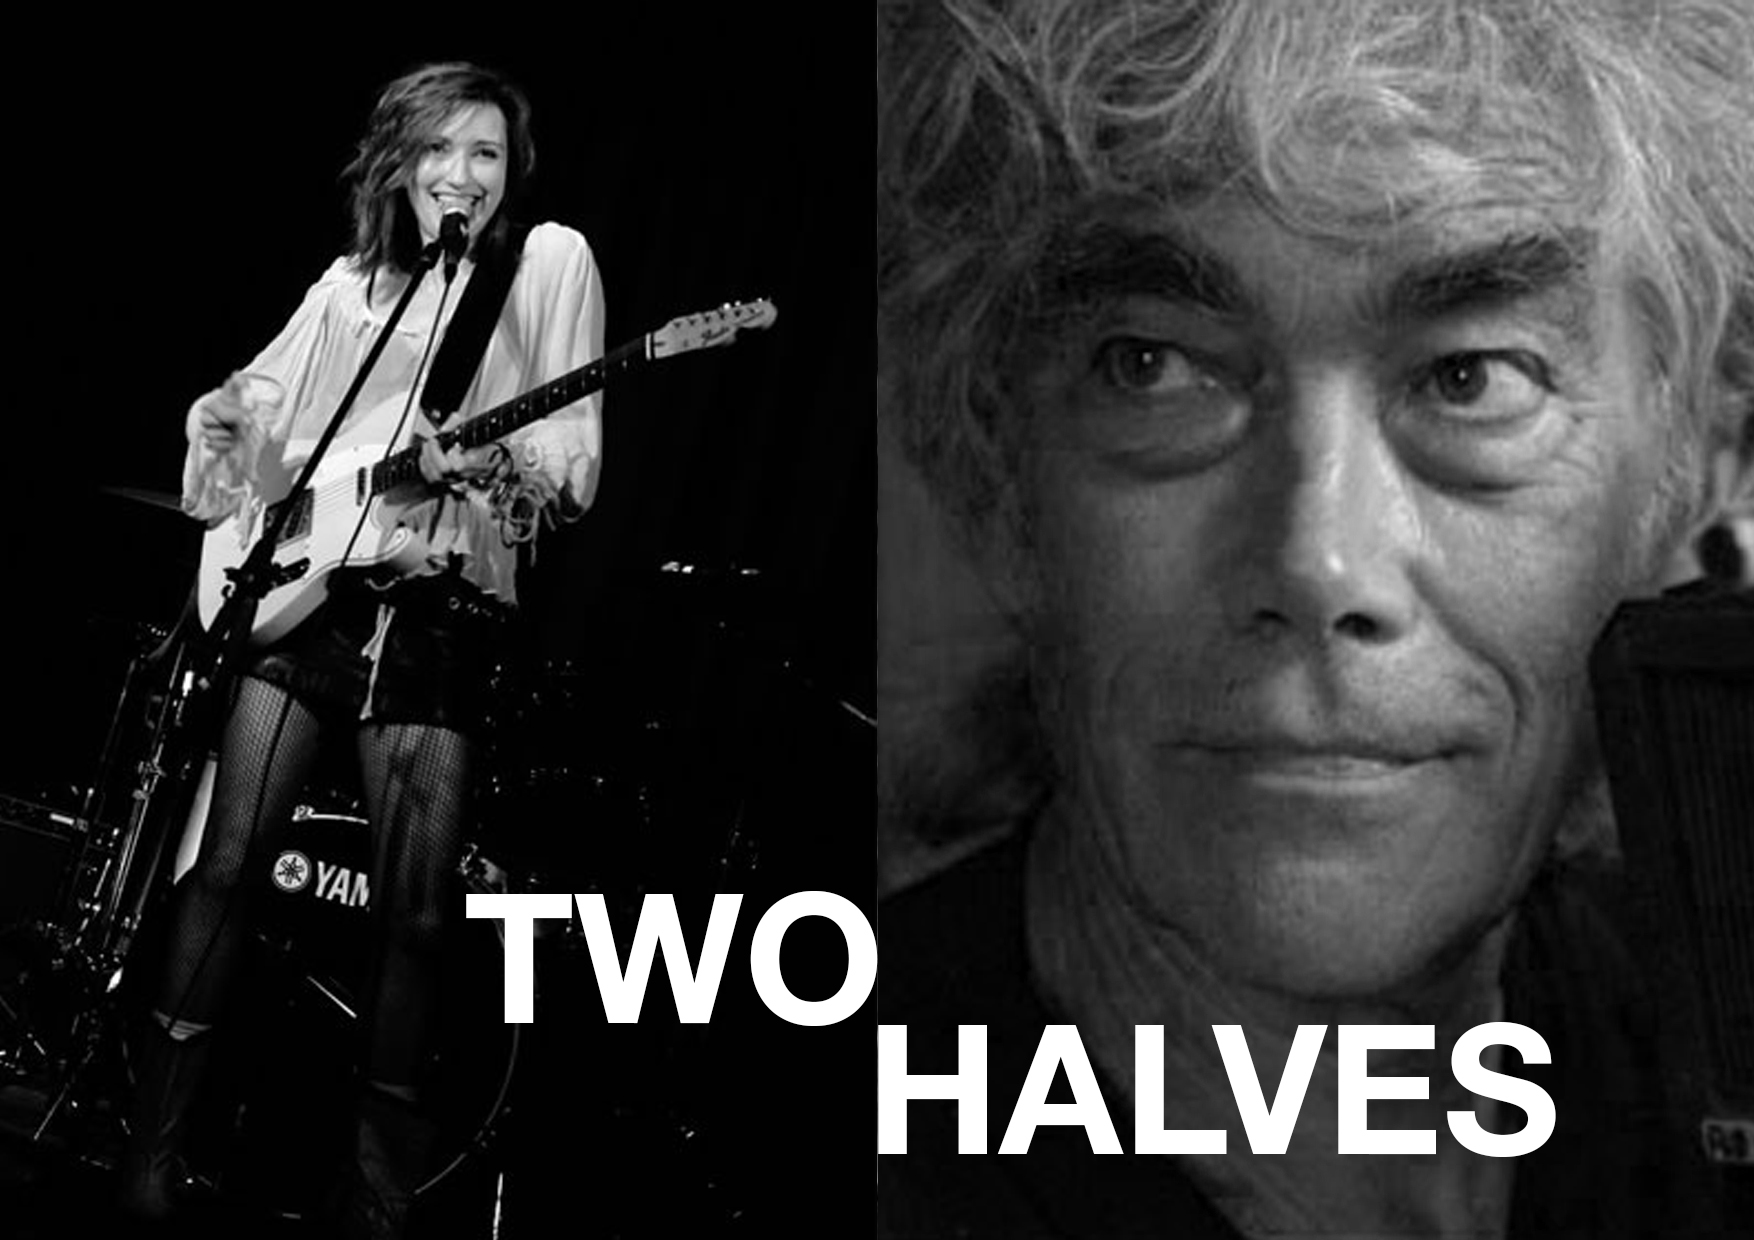 Two Halves Viv William